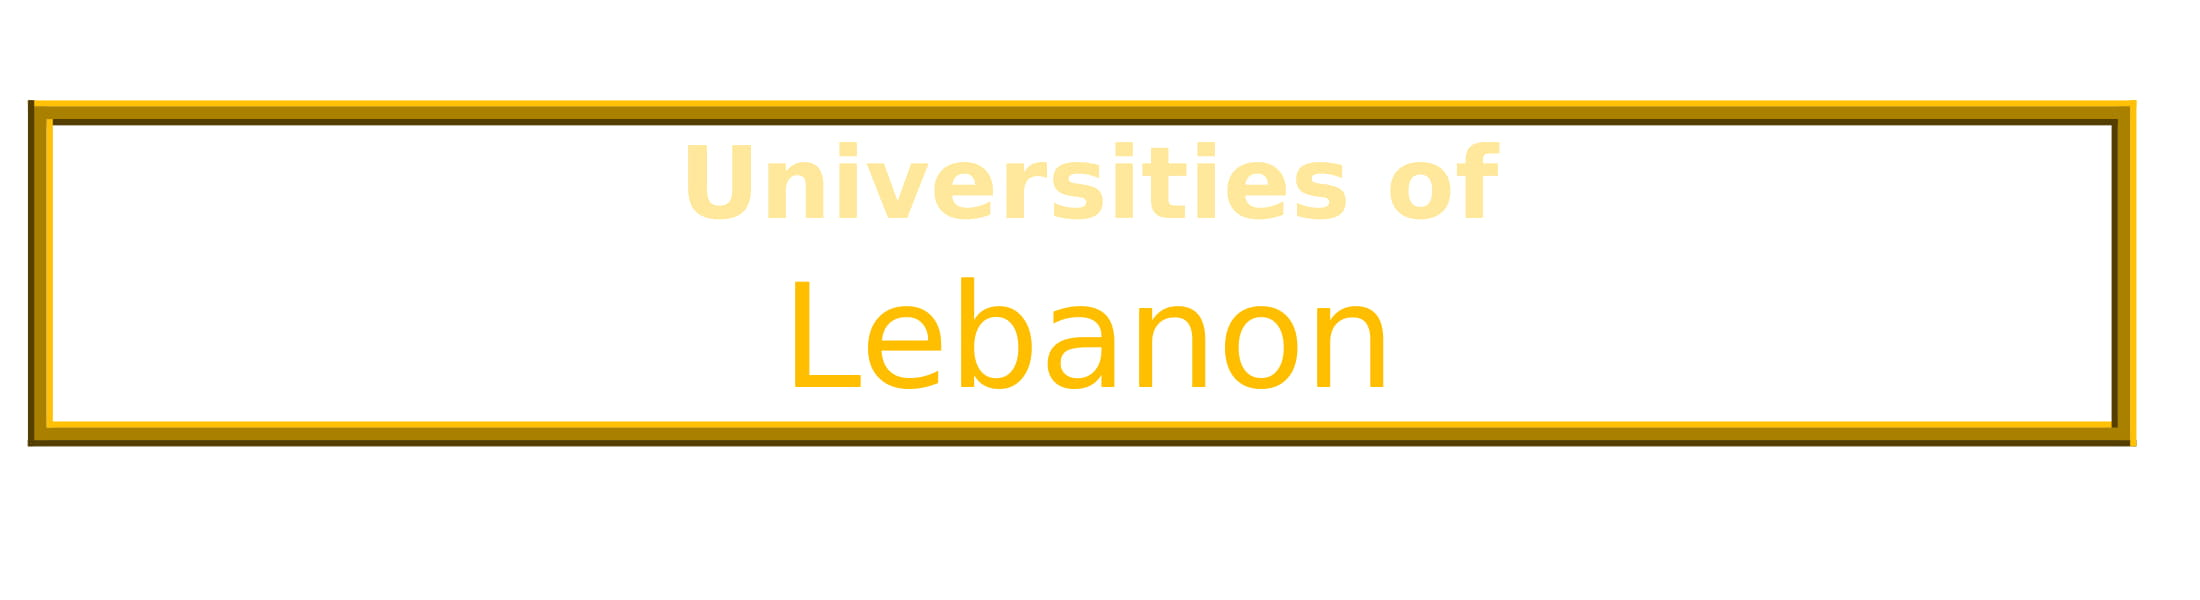 List of Universities in Lebanon